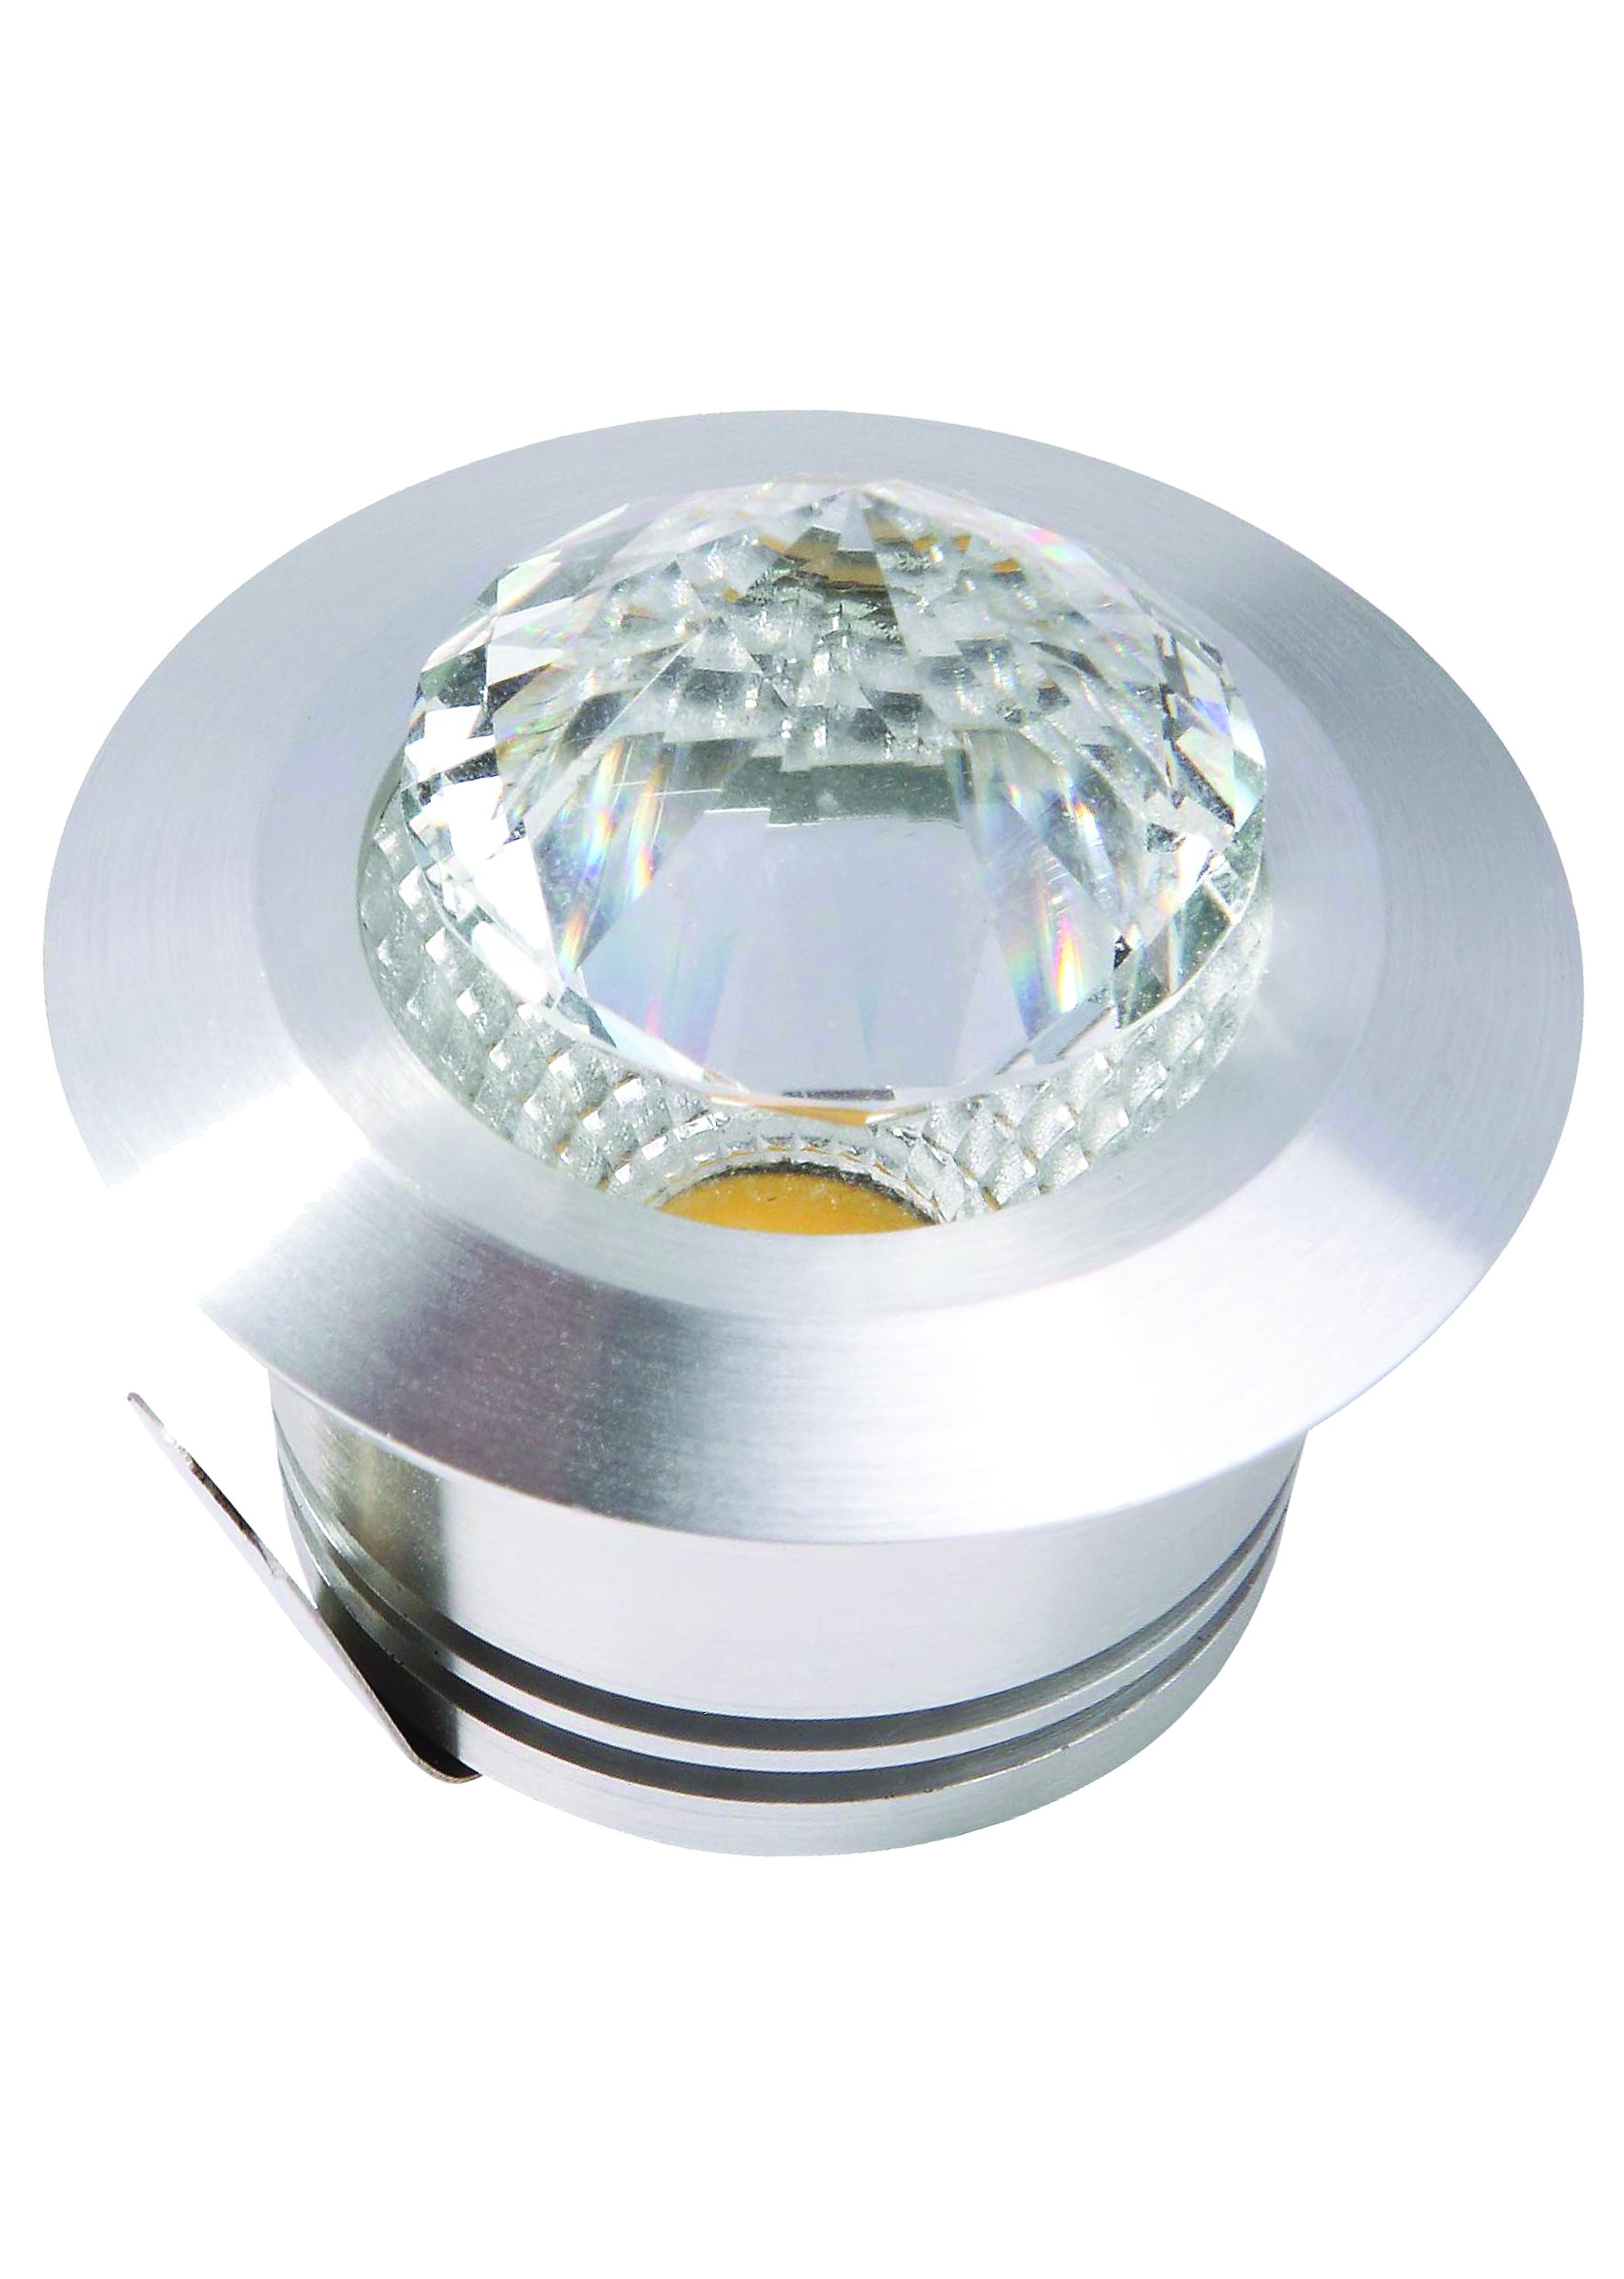 180° Beam Angle LED Warm White Star Light (B1A-31W) - VETi